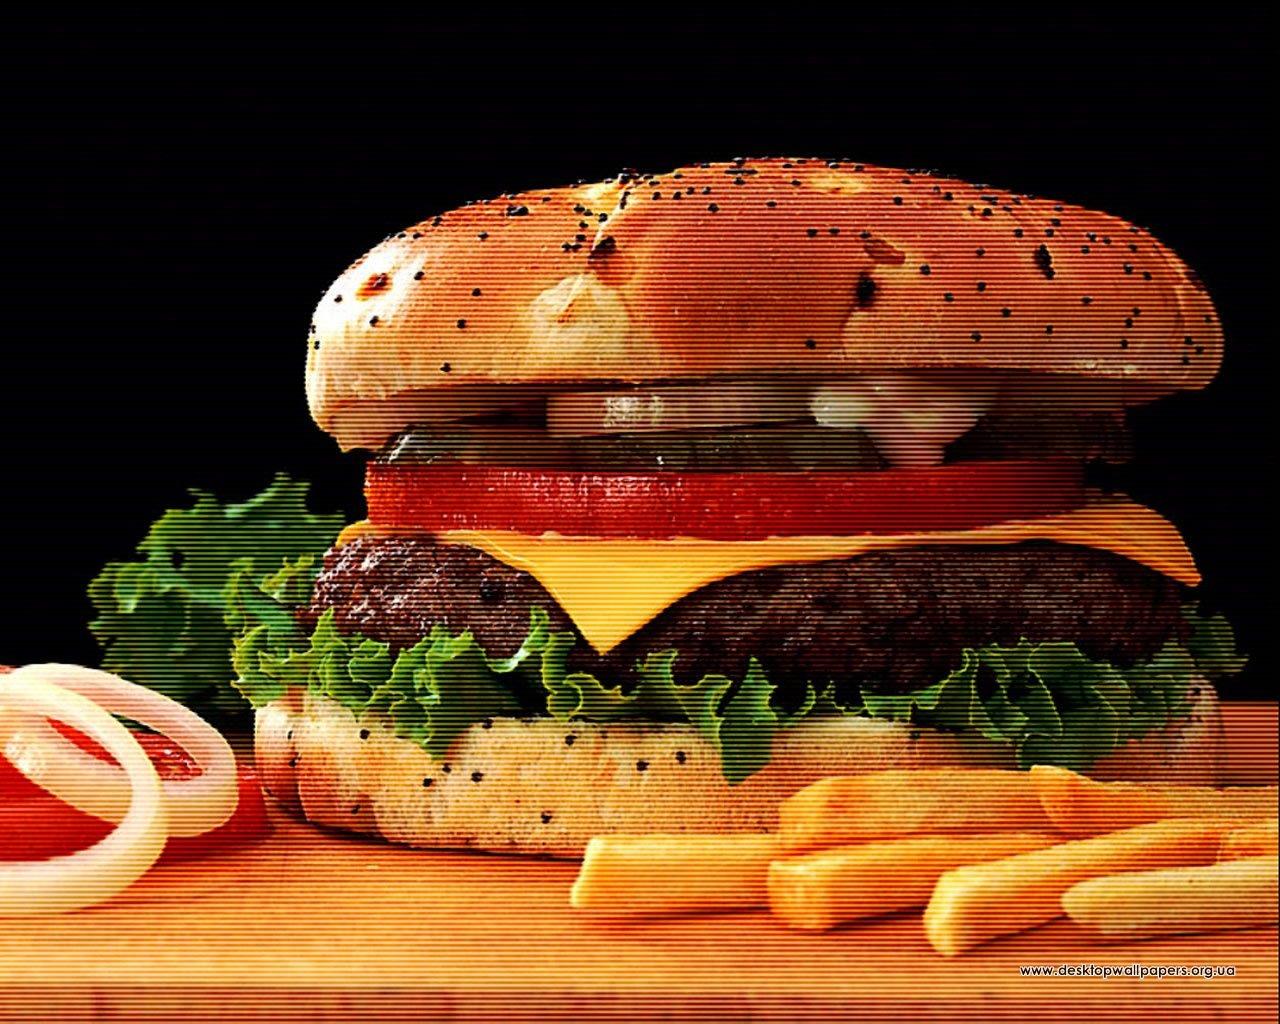 food desktop wallpaper   wwwhigh definition wallpapercom 1280x1024